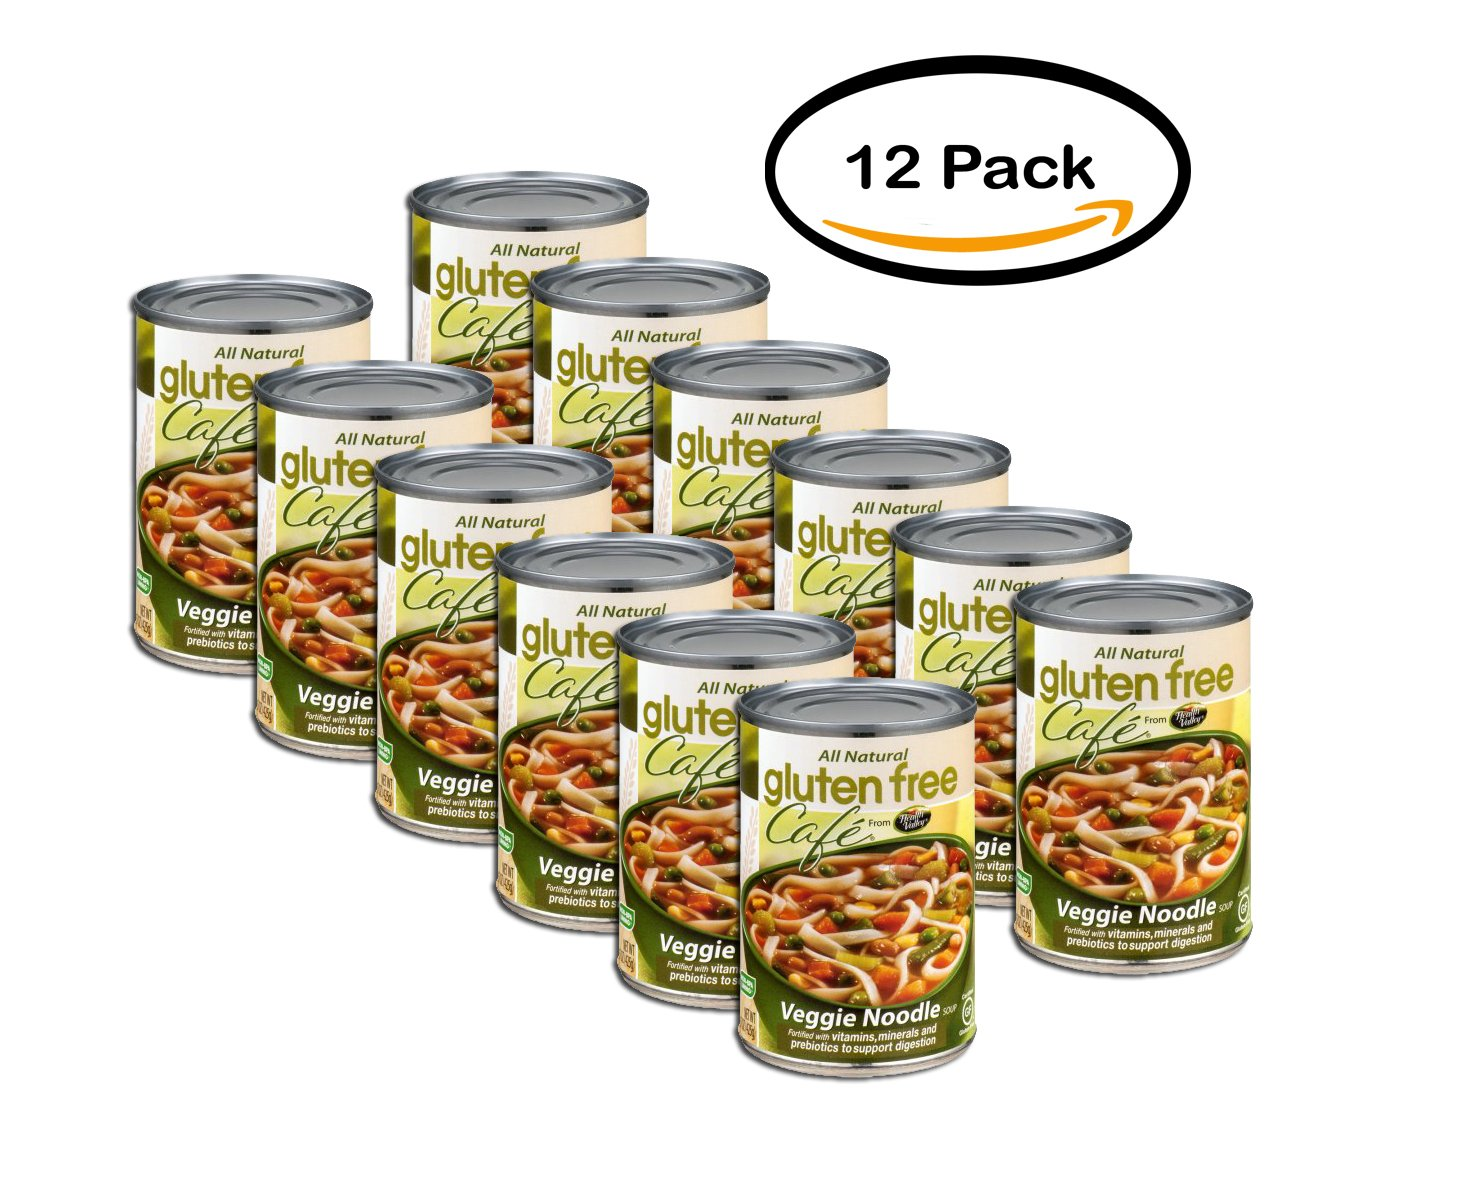 PACK OF 12 - Gluten Free Cafe Soup Veggie Noodle, 15.0 OZ